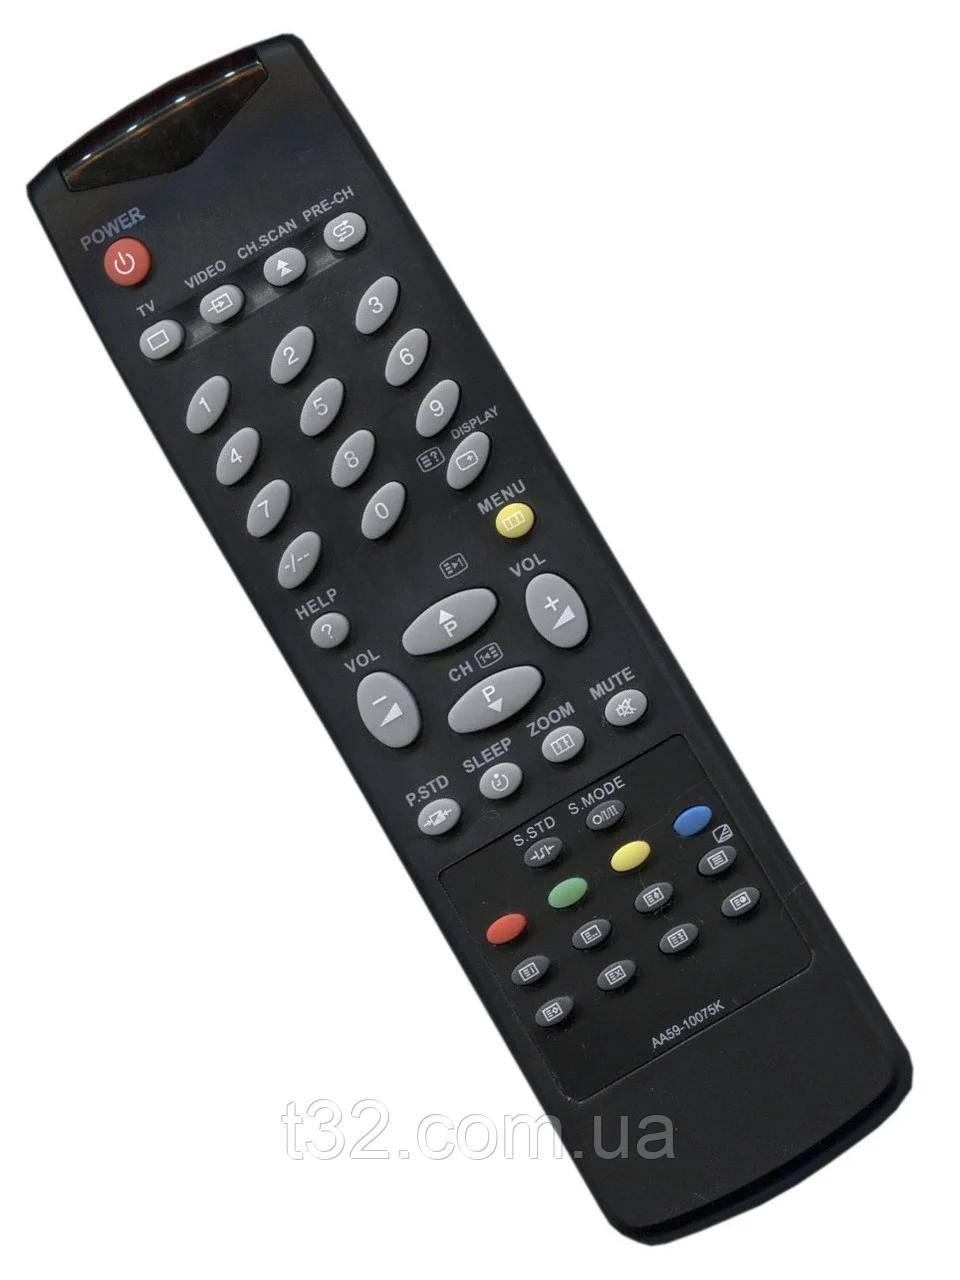 Пульт для Samsung AA59-10075K[TV]13/41